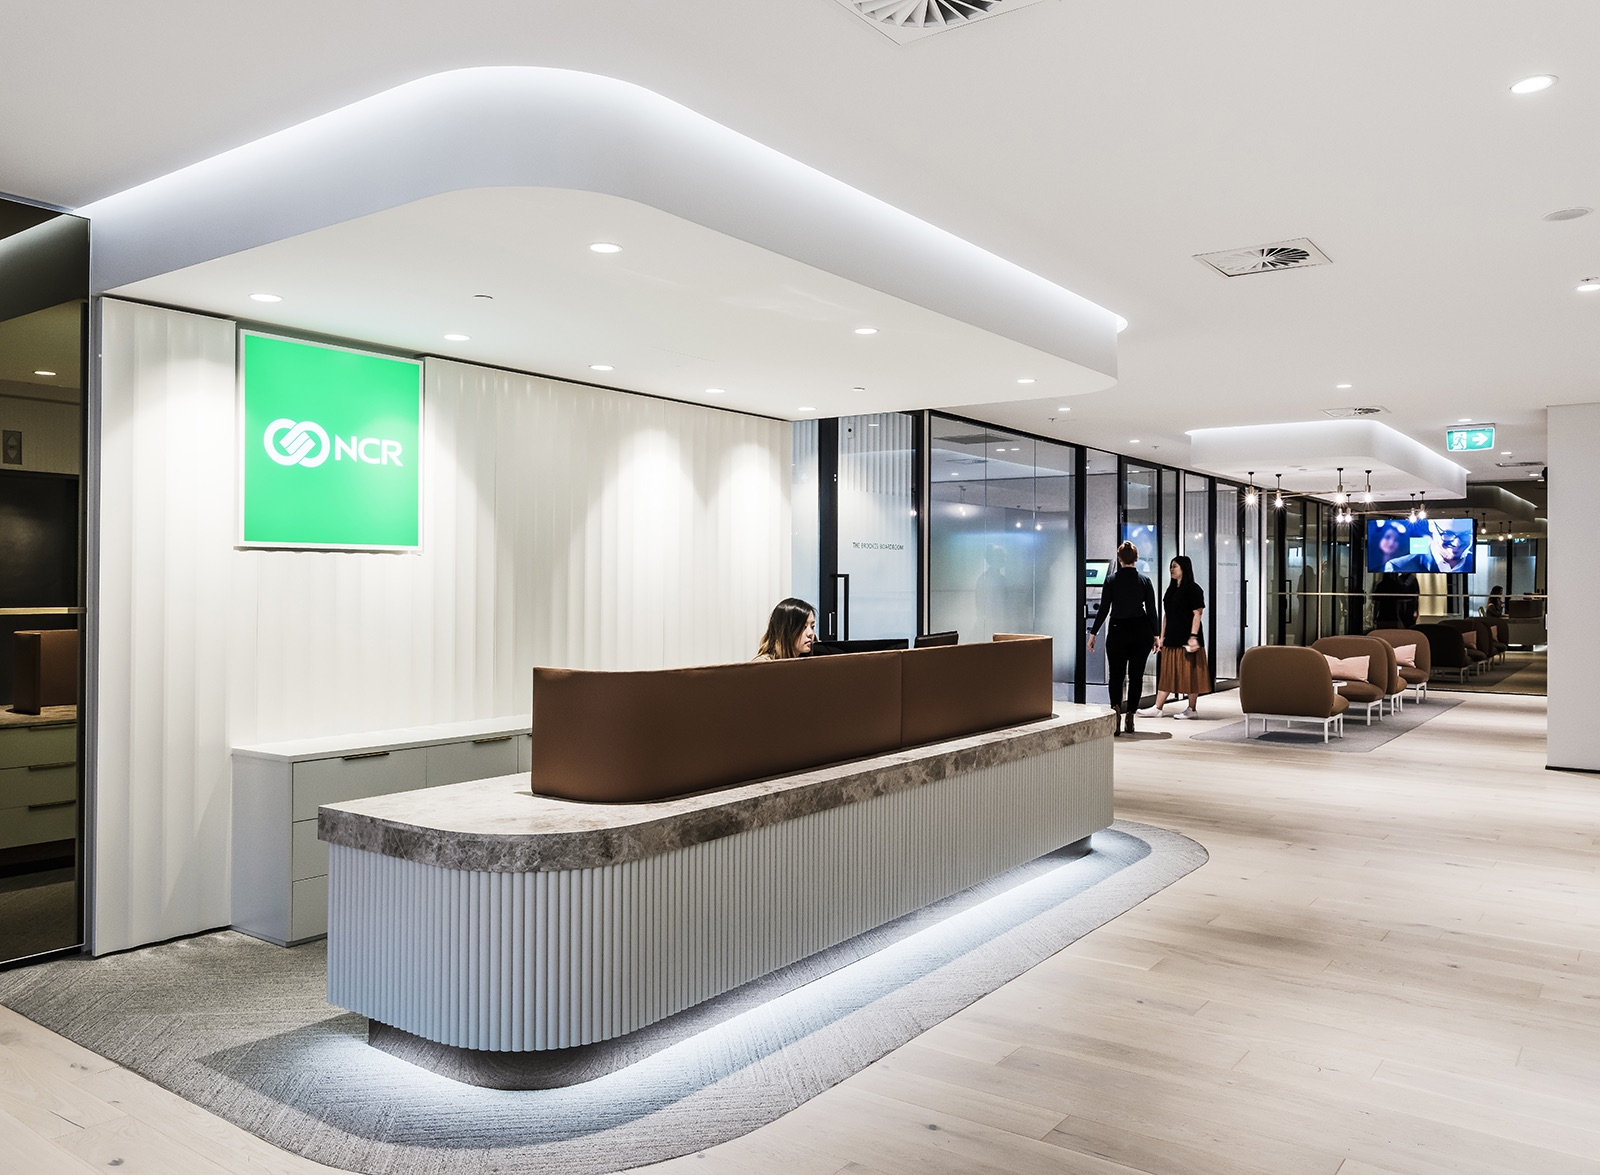 A Tour of NCR's Sleek New Sydney Office